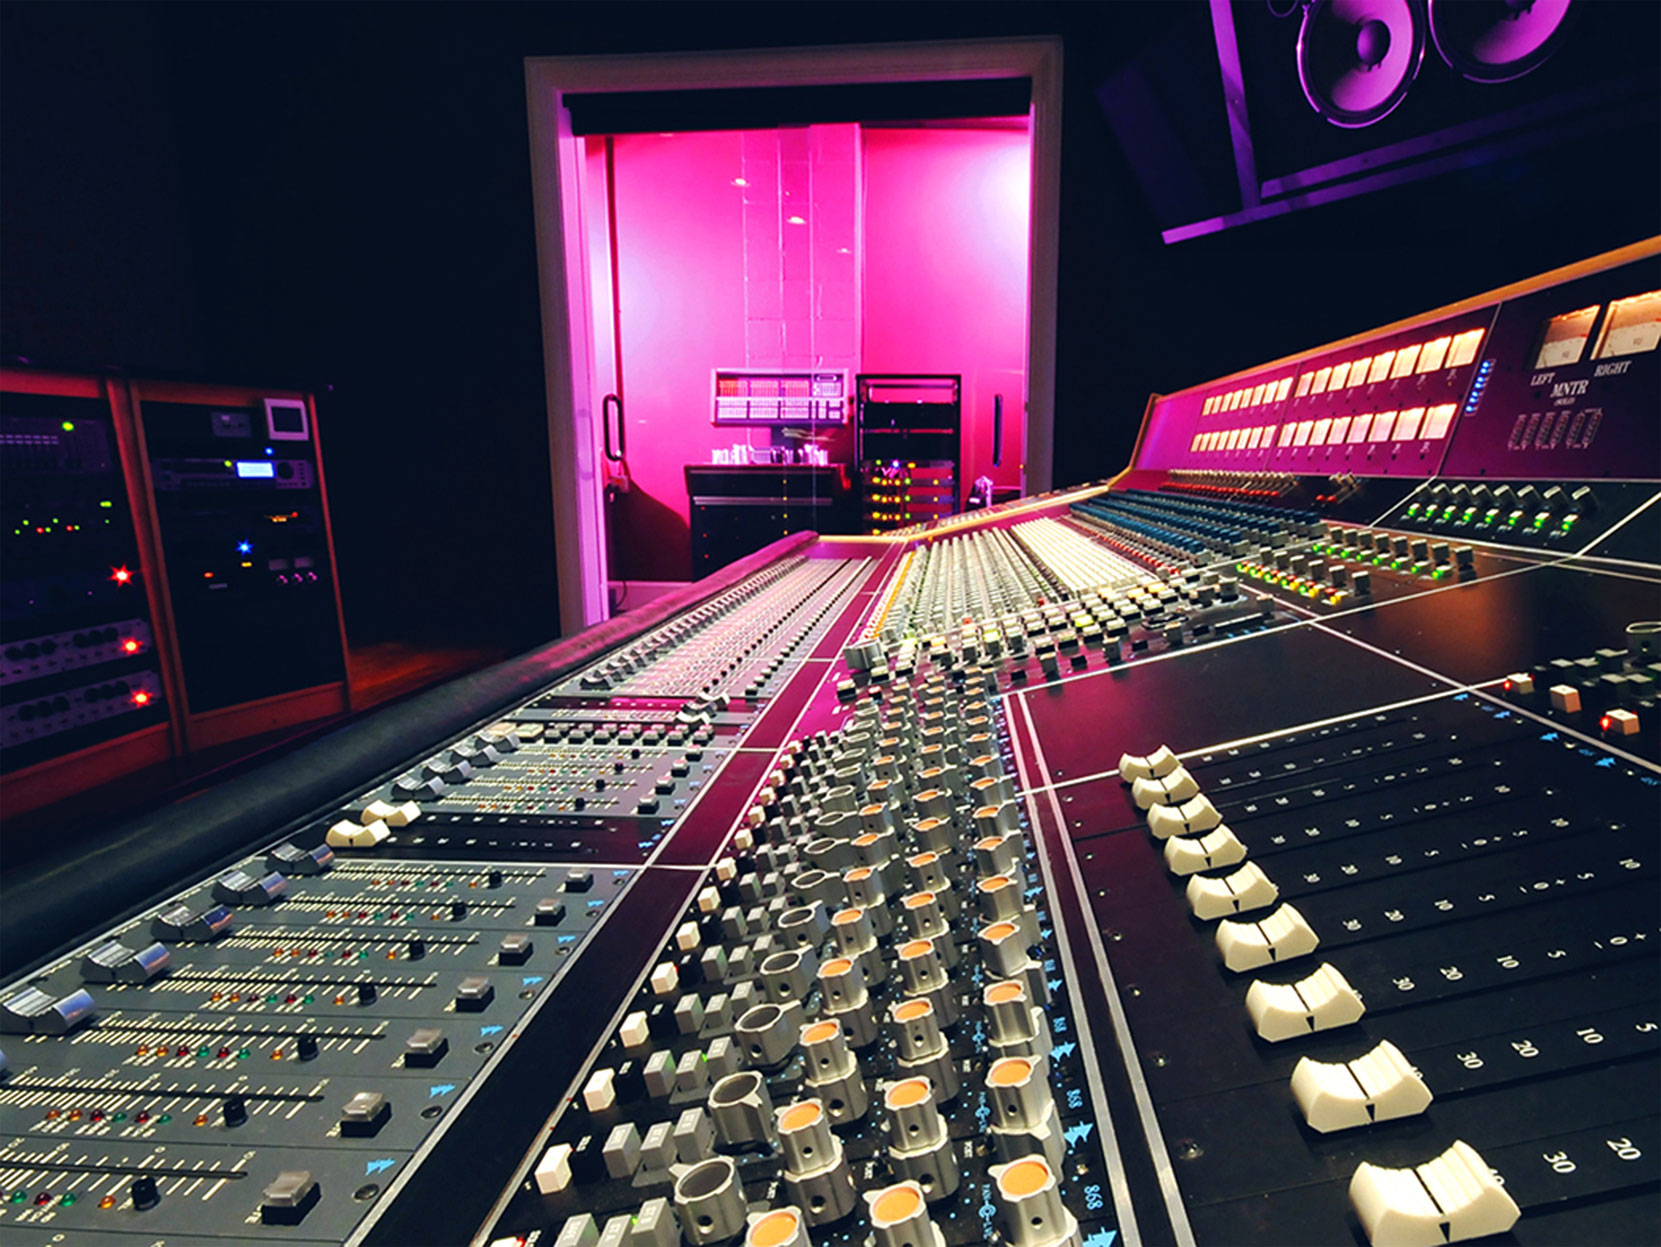 malaco-studios